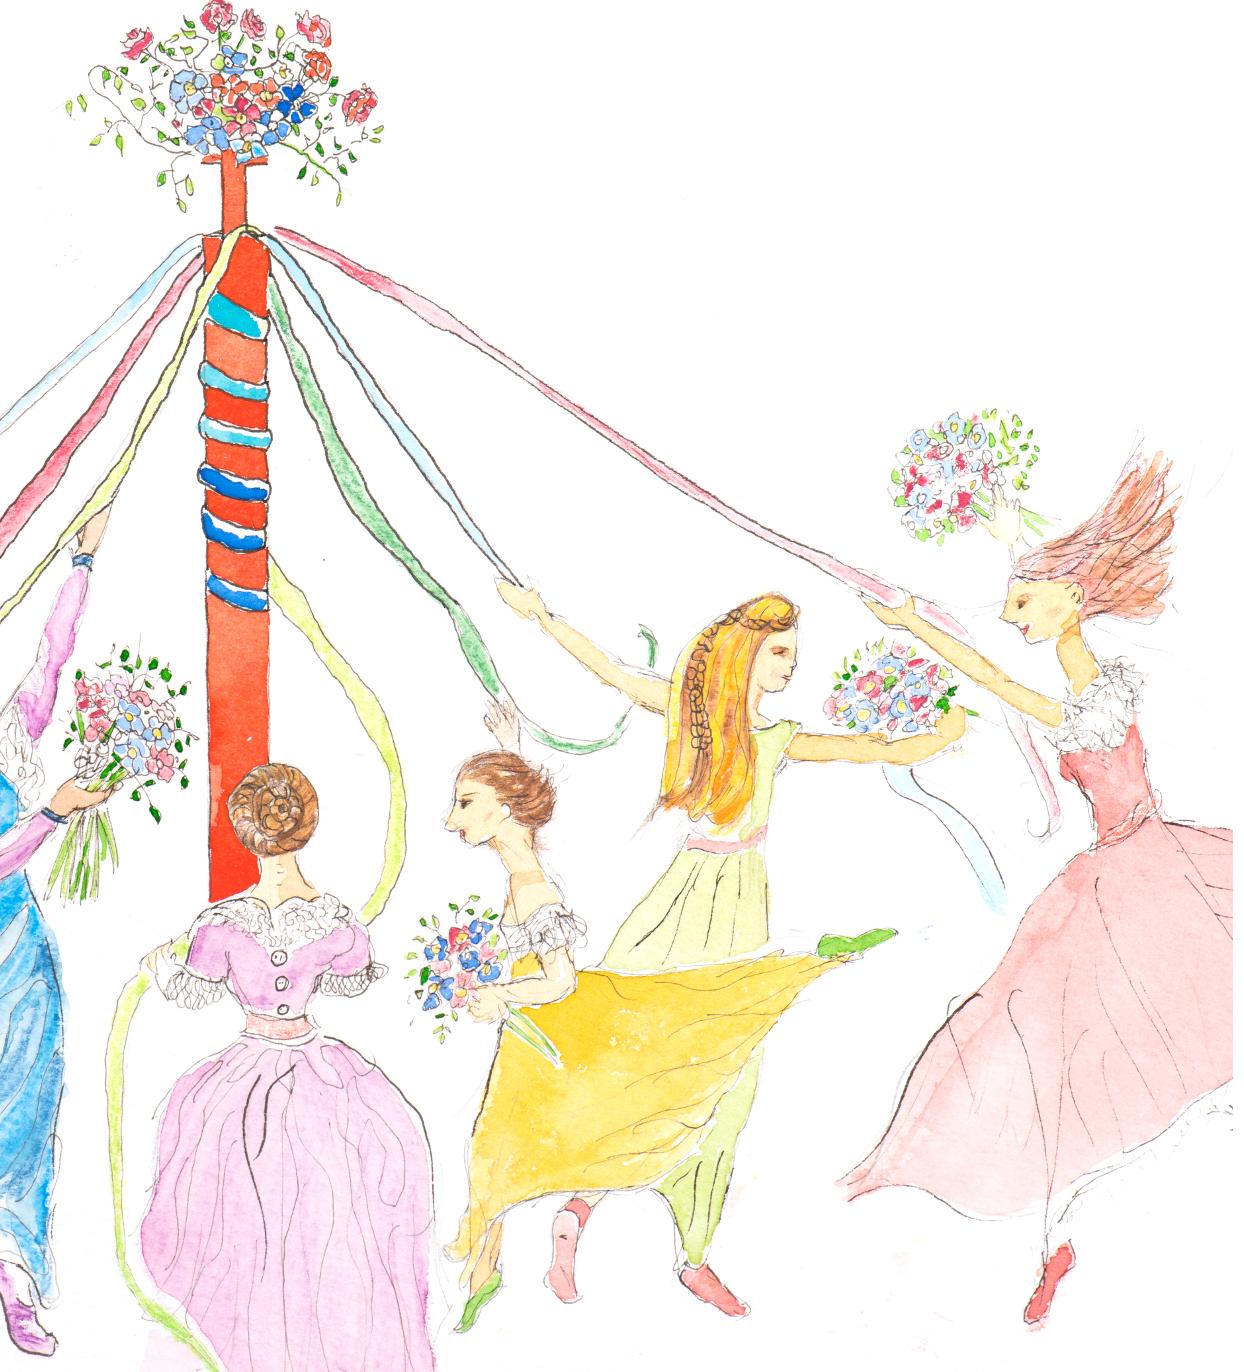 Maypole dancers - detail